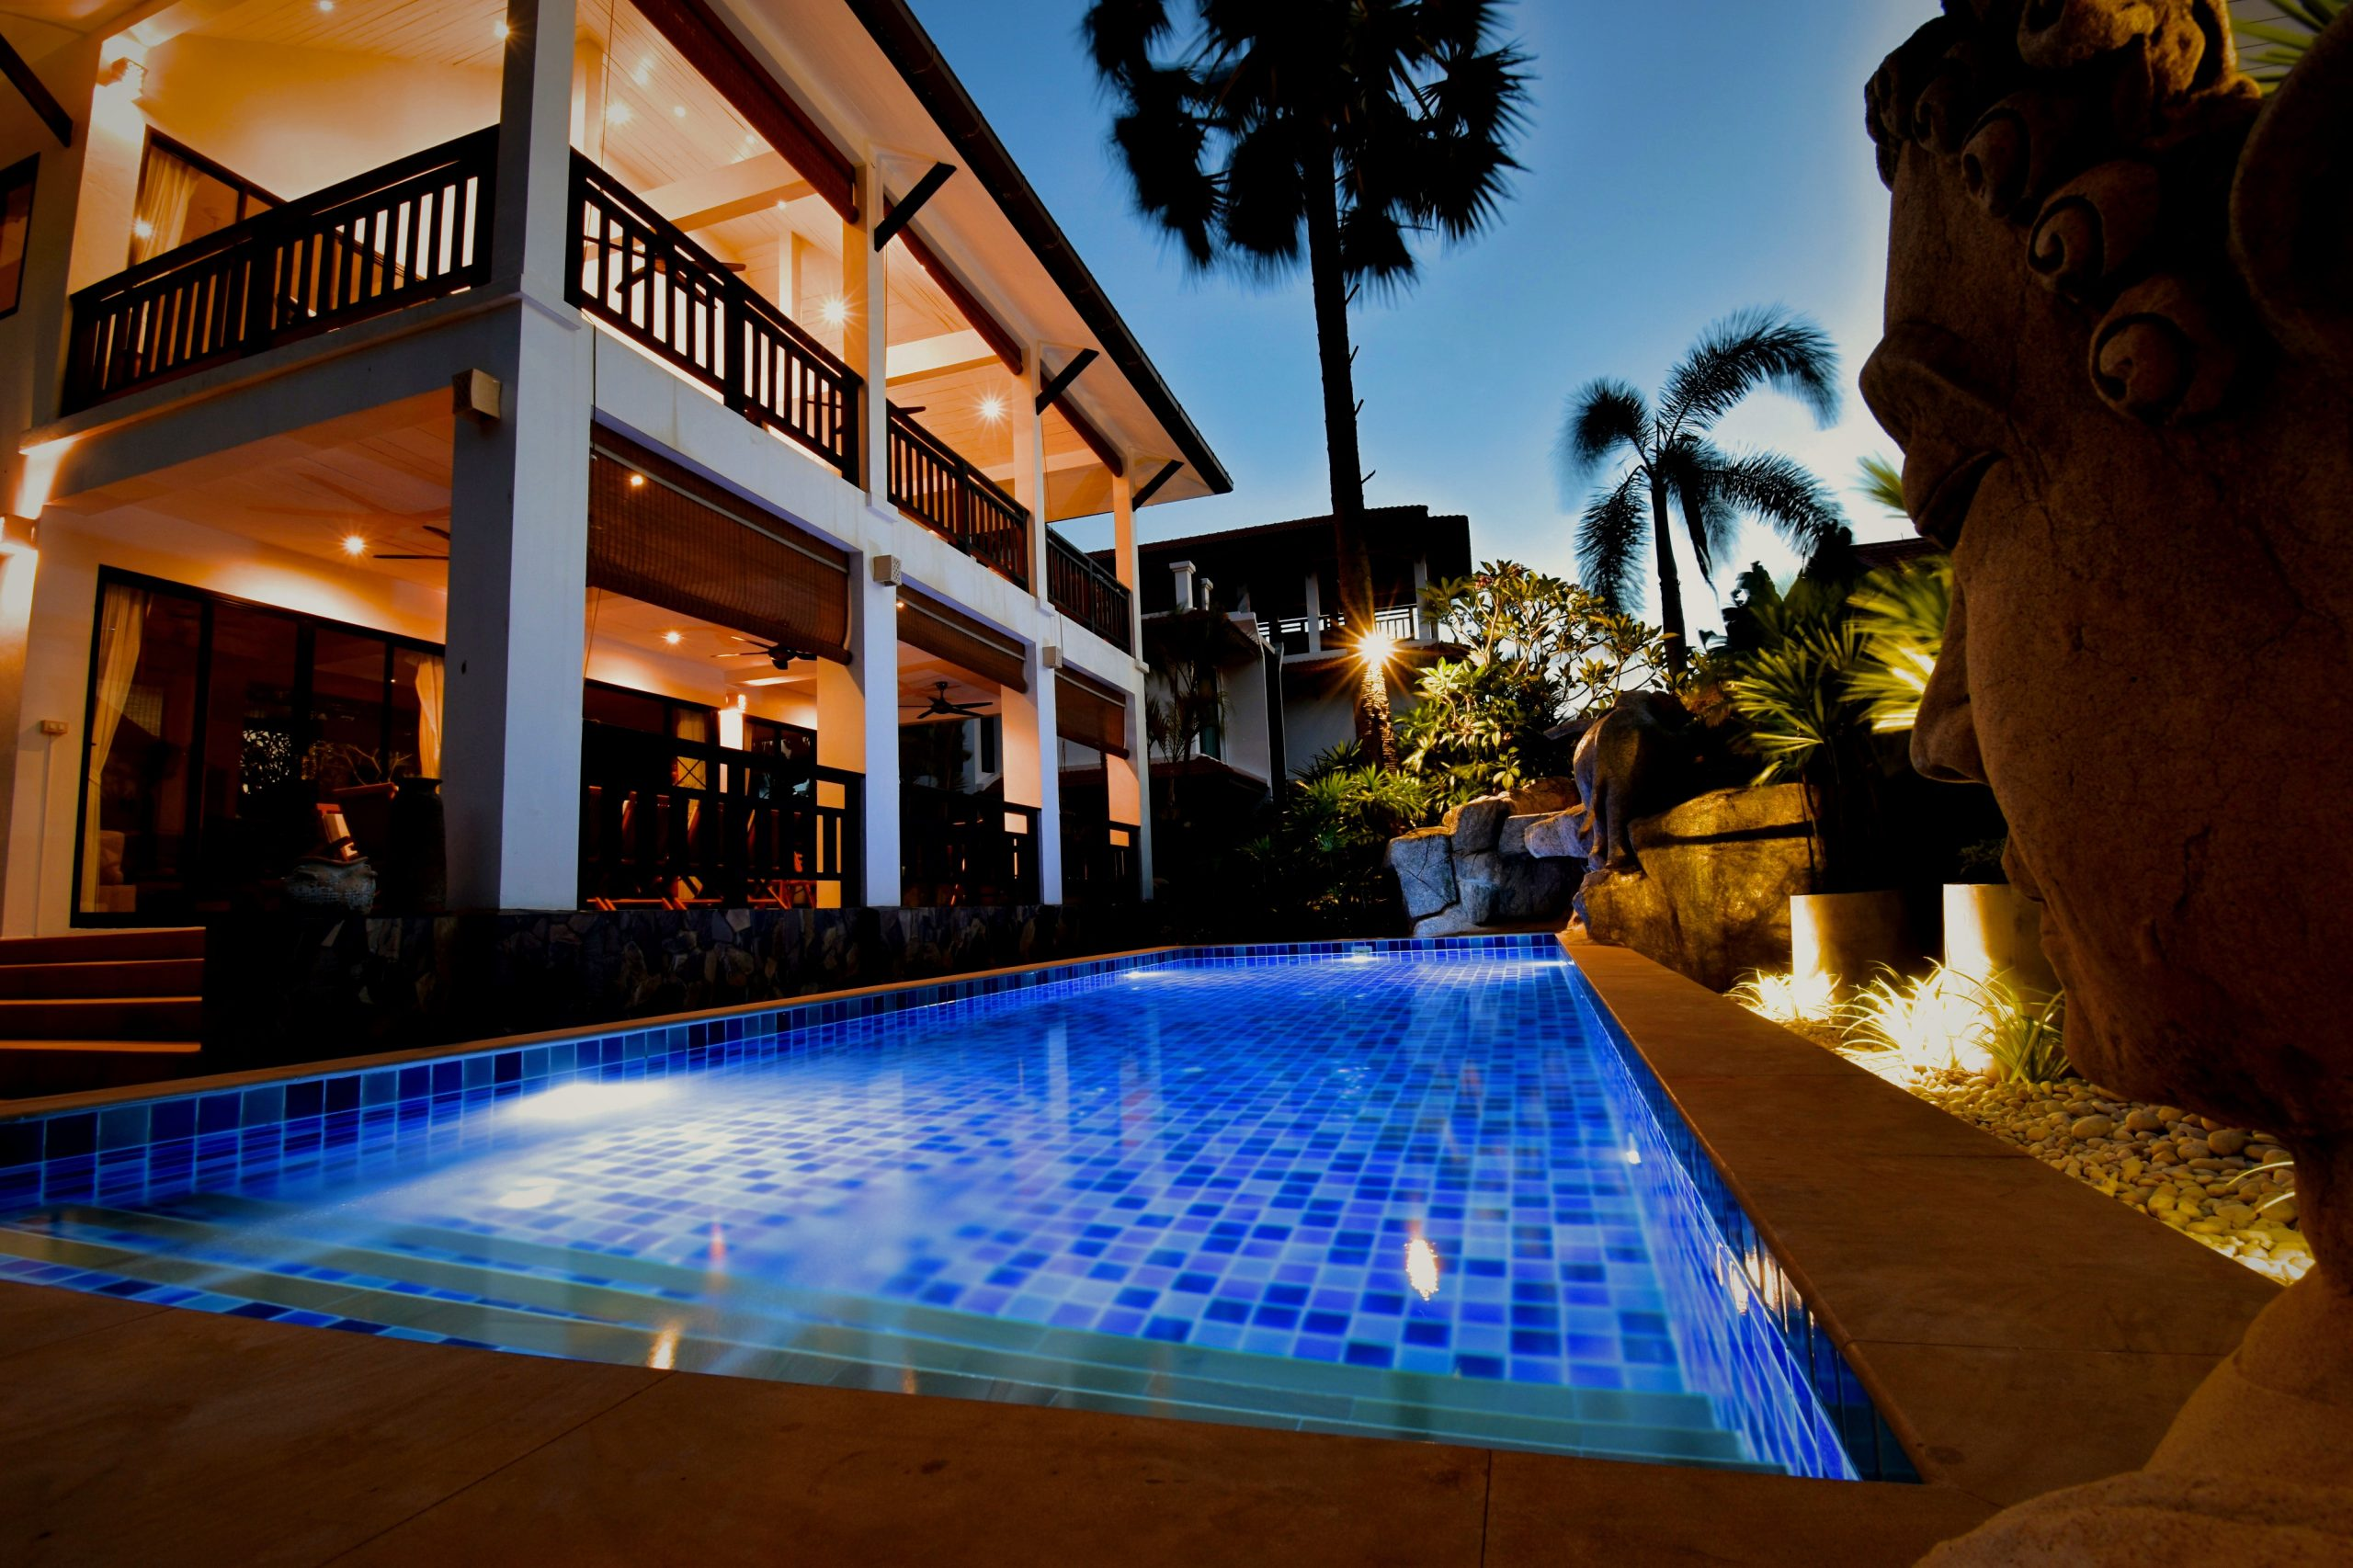 Book Koh Lanta Malee Seaview villa